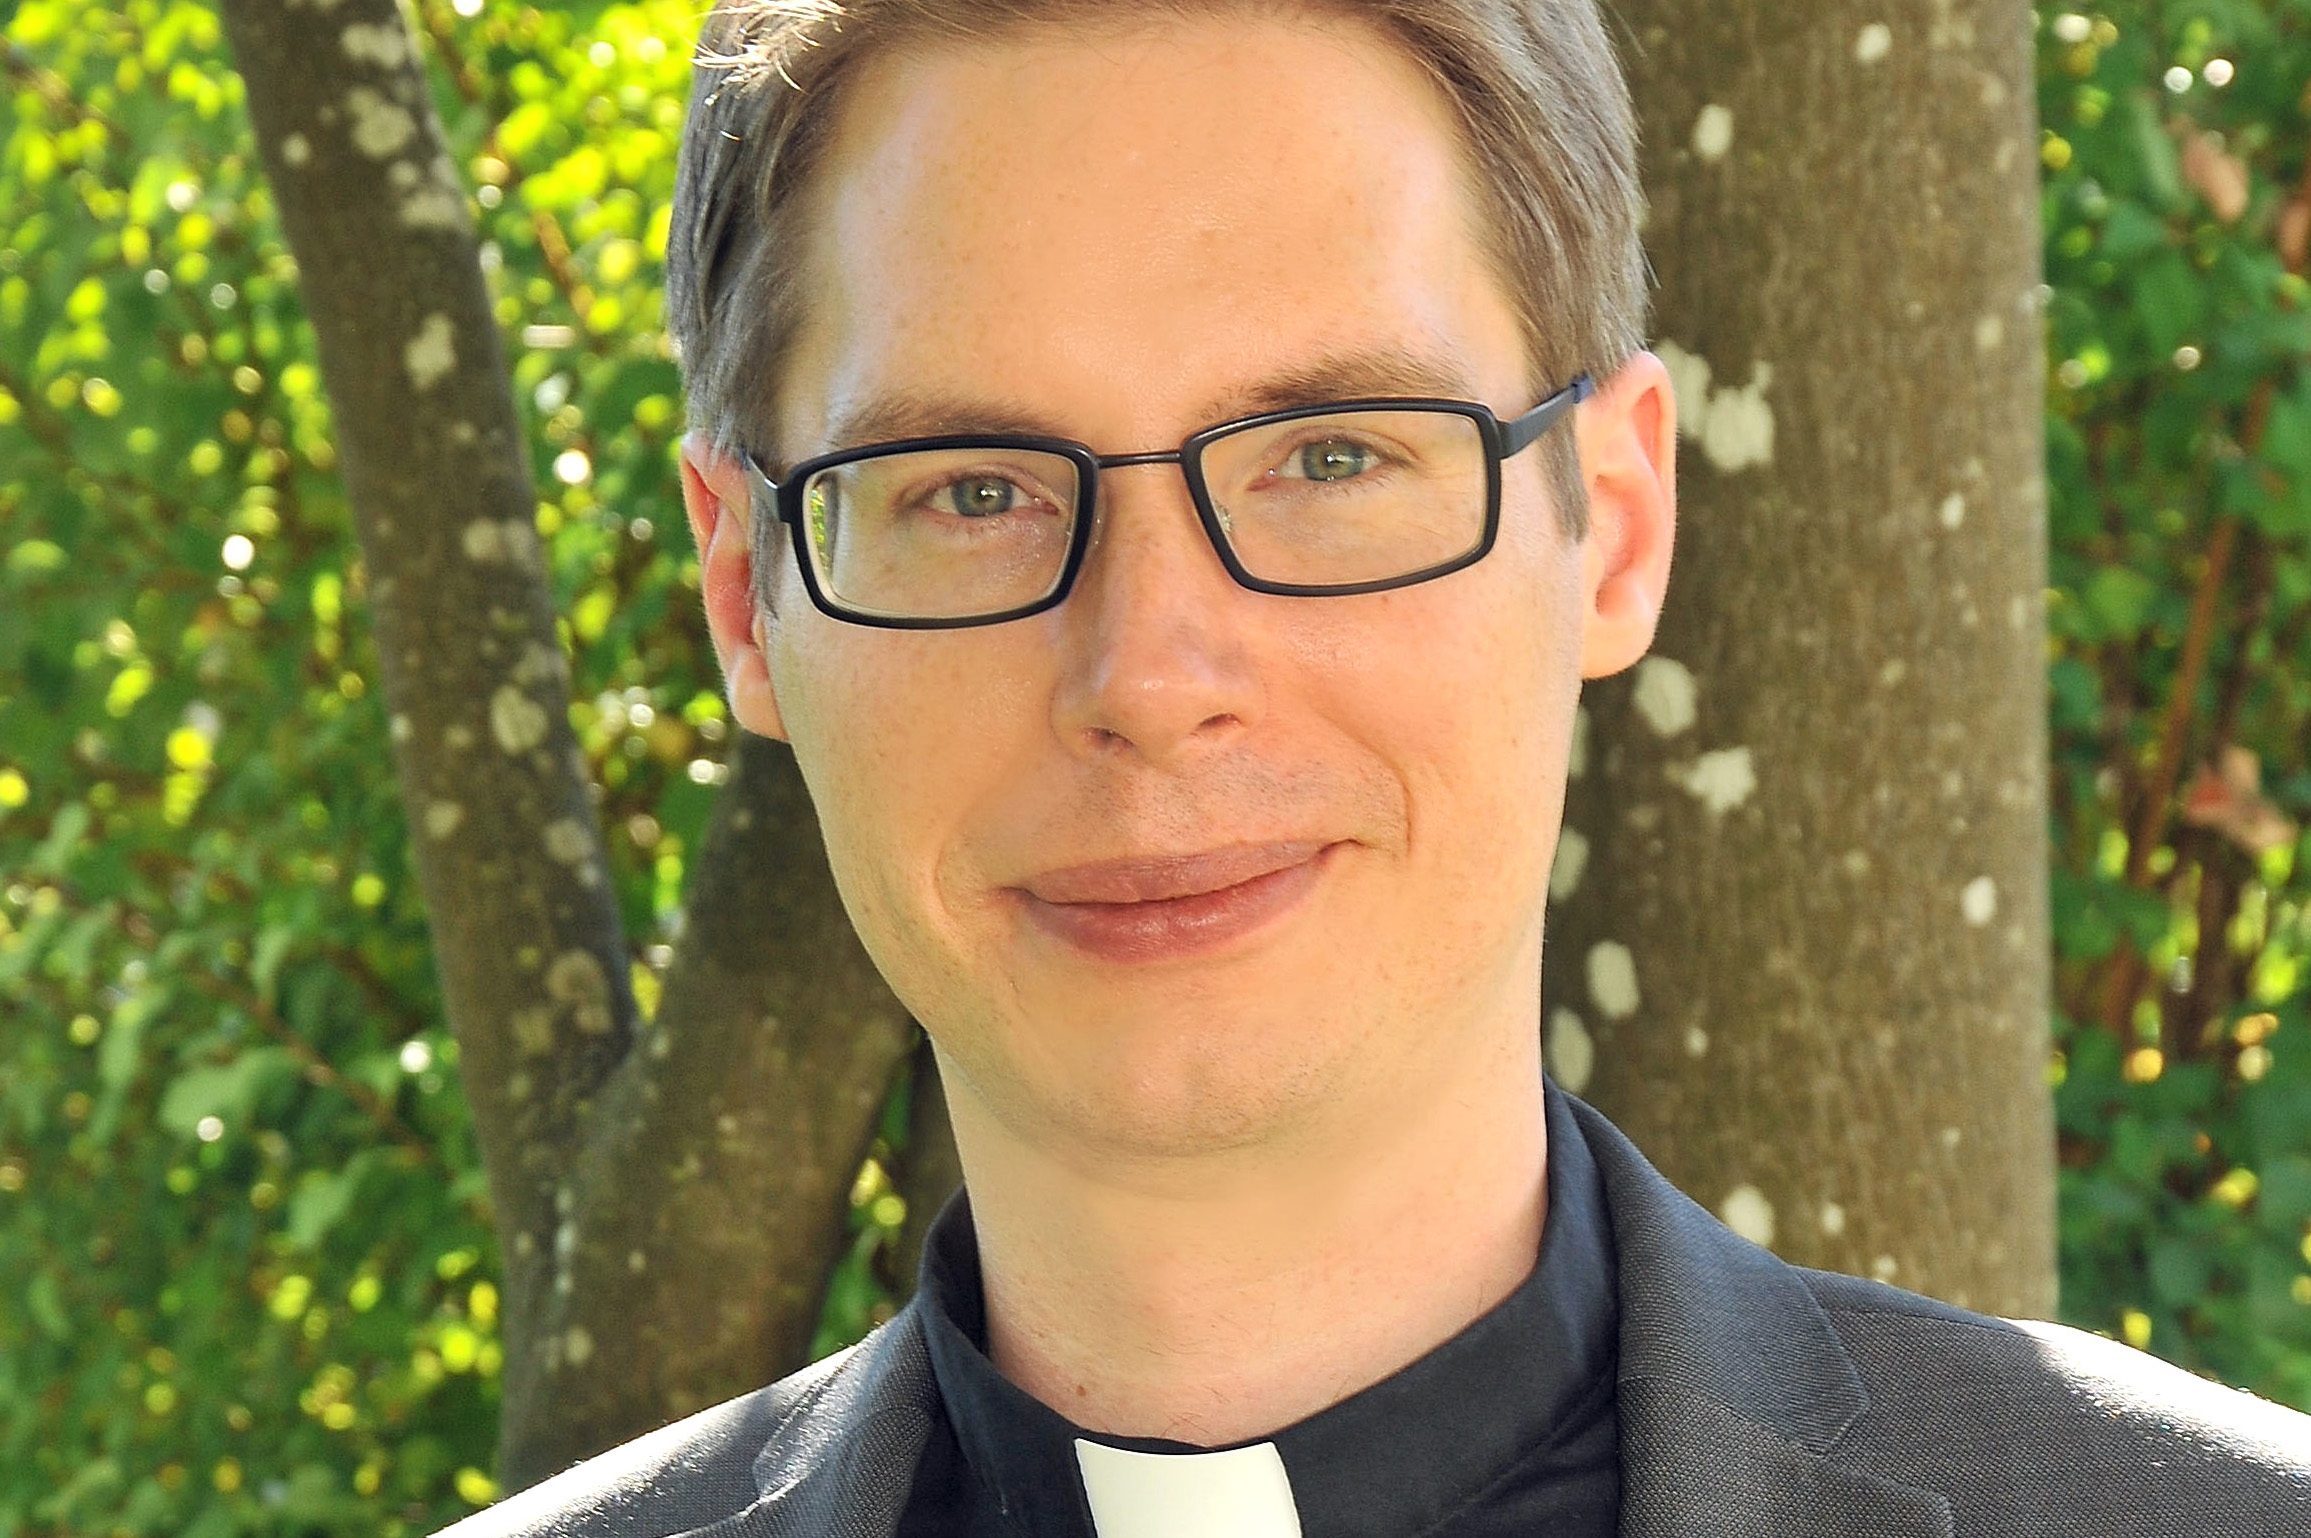 Pfarrer Tobias Wolf, künftiger Diözesanjugendpfarrer. (Foto: privat)